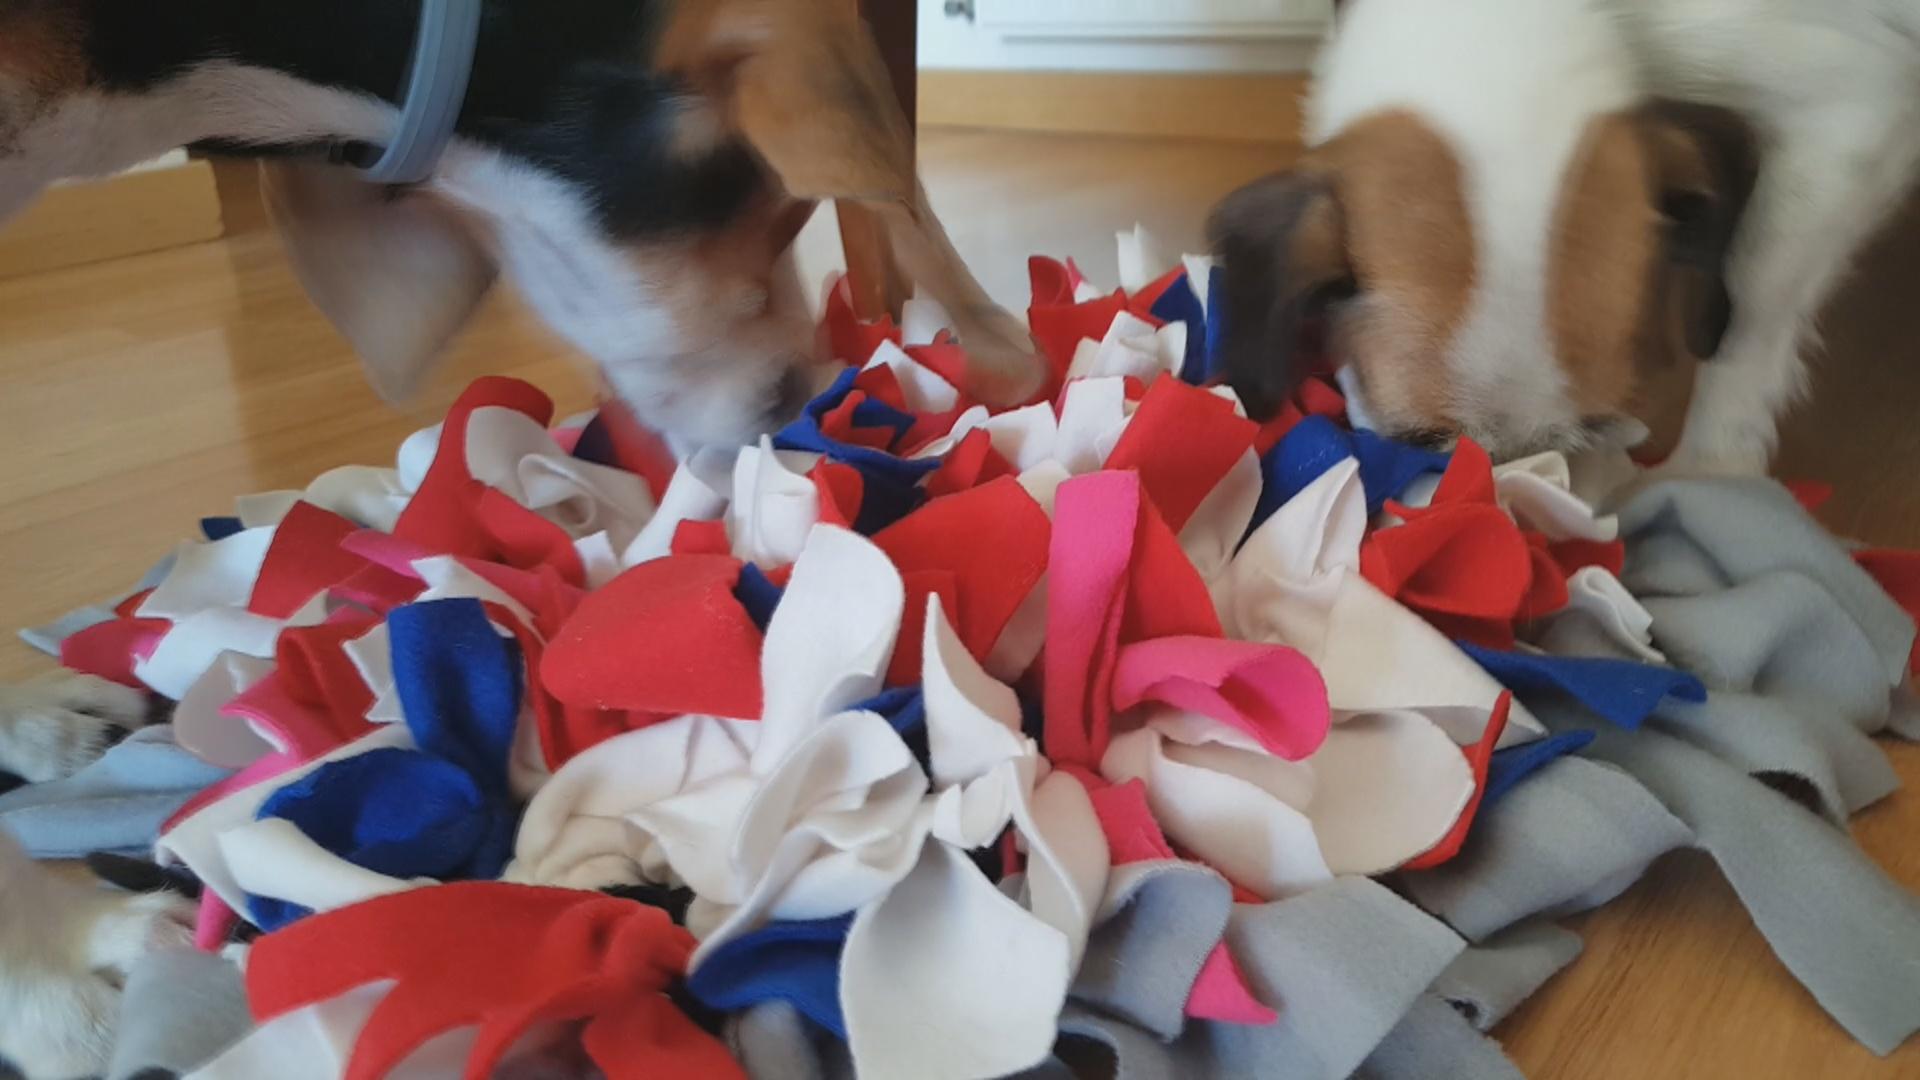 Snuffle Mat Alfombra olfato perro alfombra olfativa para perros comprar ofertas opiniones barato alfombras para perros alfombra olfativa snuffle mat alfombra de olfato para perros comprar alfombra de olfato para perros oferta Como hacer una alfombra olfativa para perros